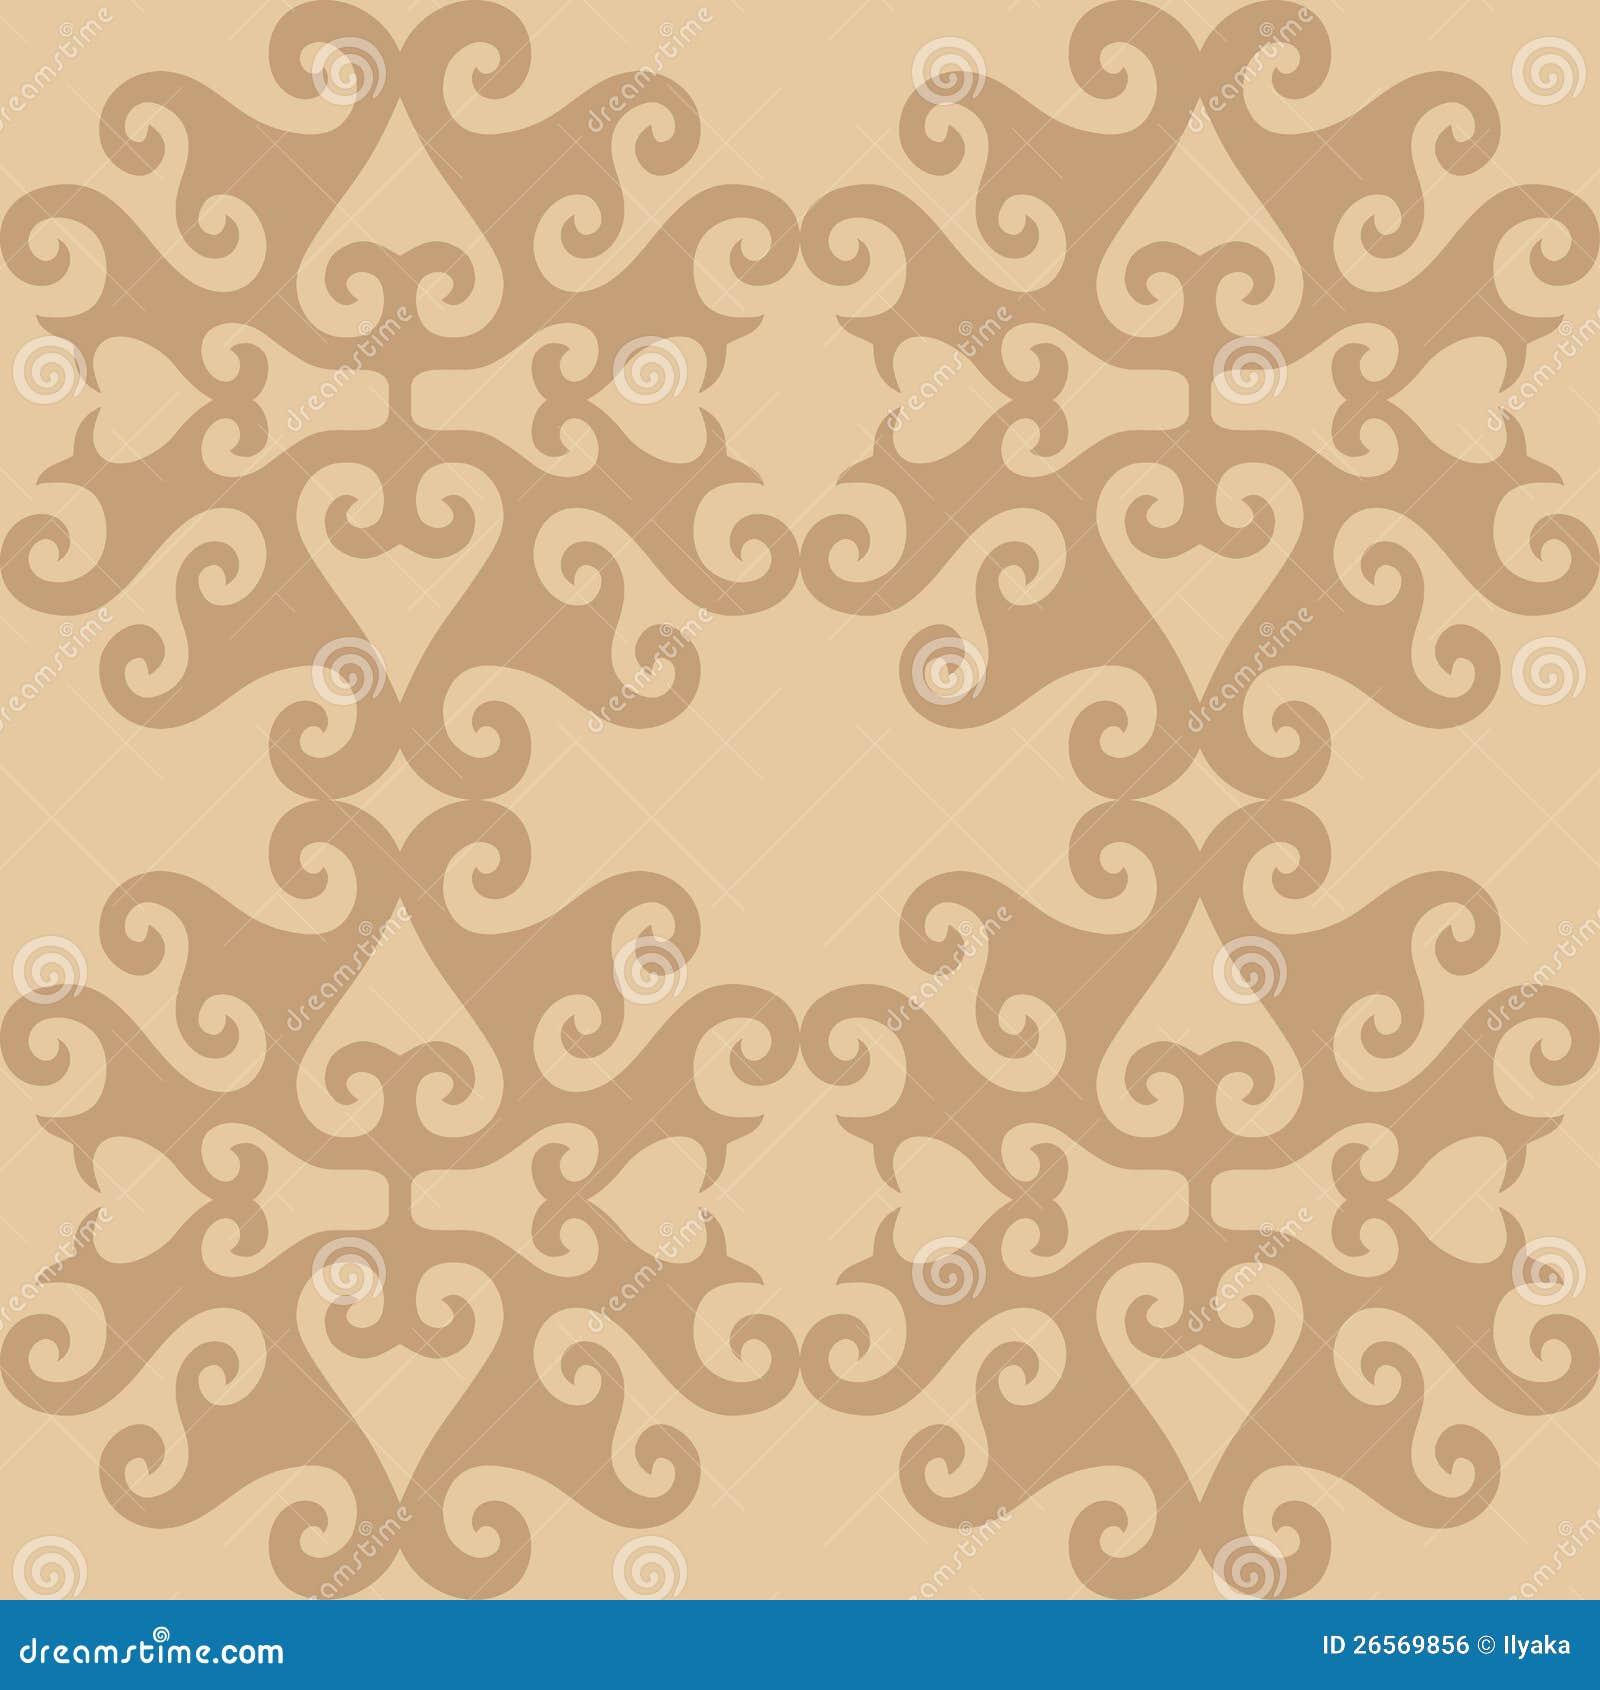 papier peint ornemental beige oriental sans joint image. Black Bedroom Furniture Sets. Home Design Ideas